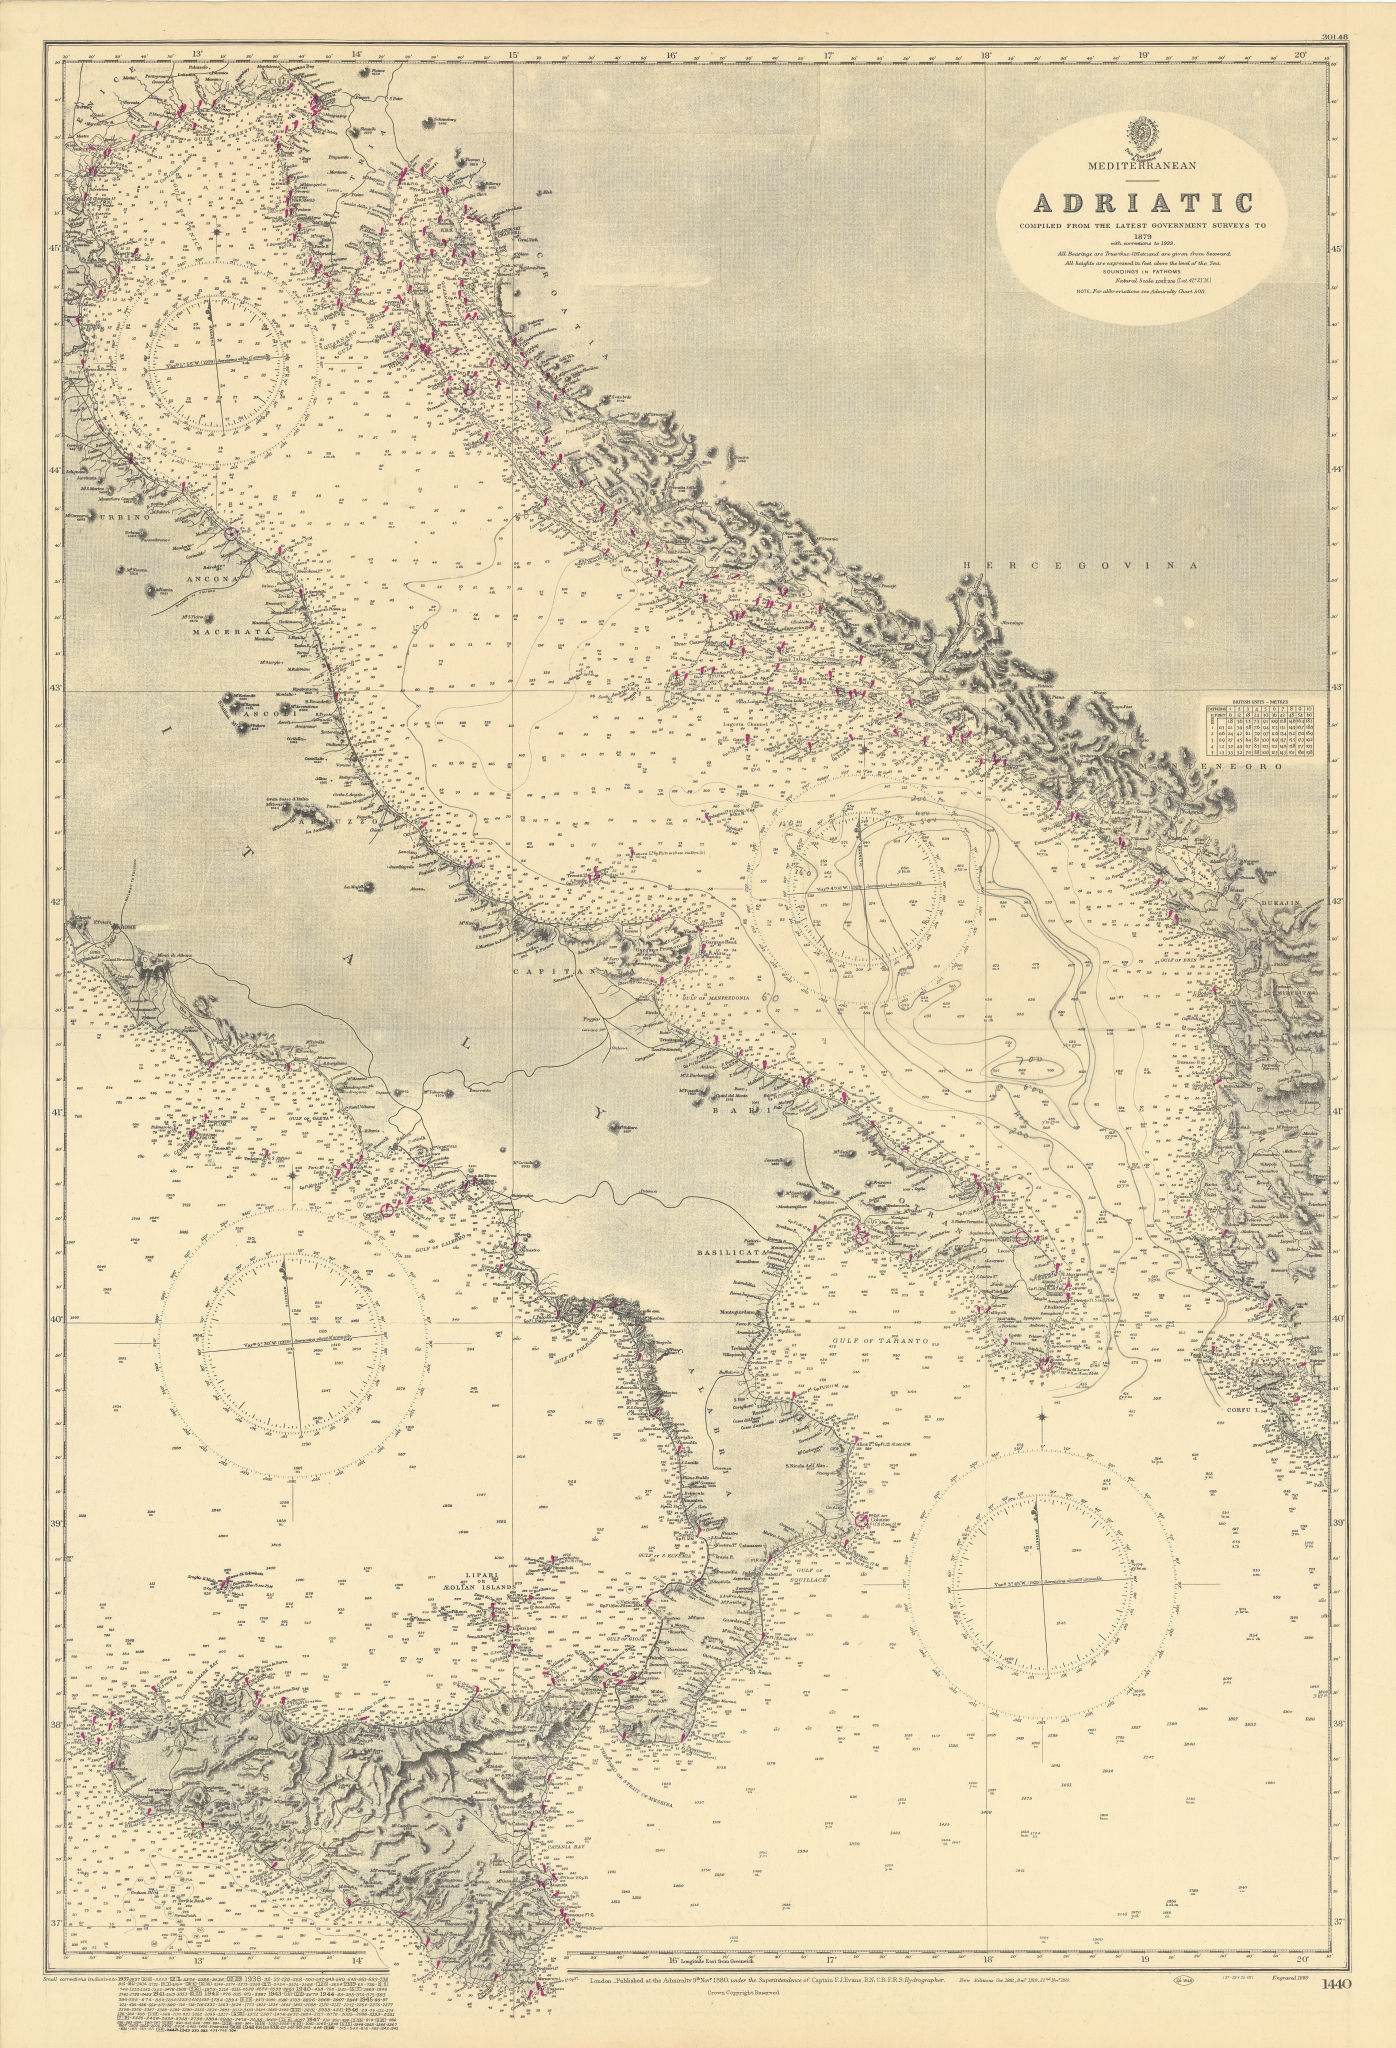 Mediterranean Adriatic Italy Croatia. ADMIRALTY sea chart 1880 (1949) old map